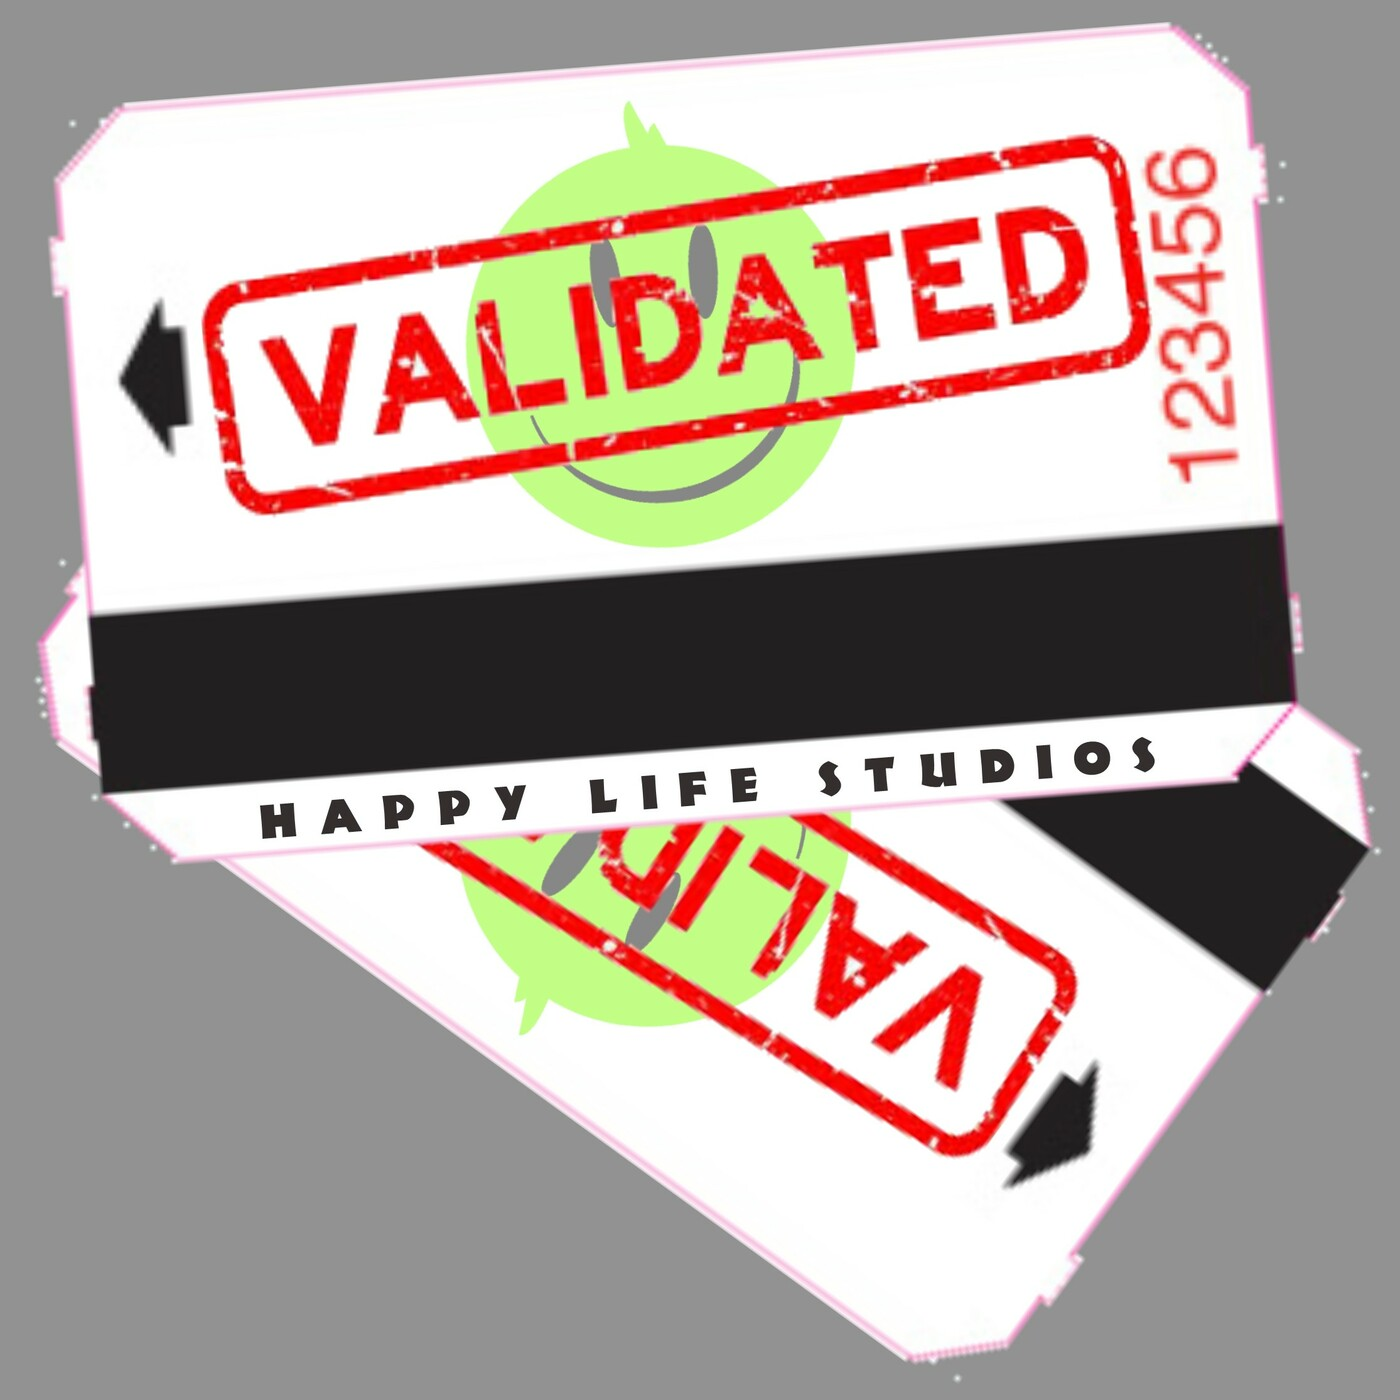 Validate HL178 Happy Life Studios podcast